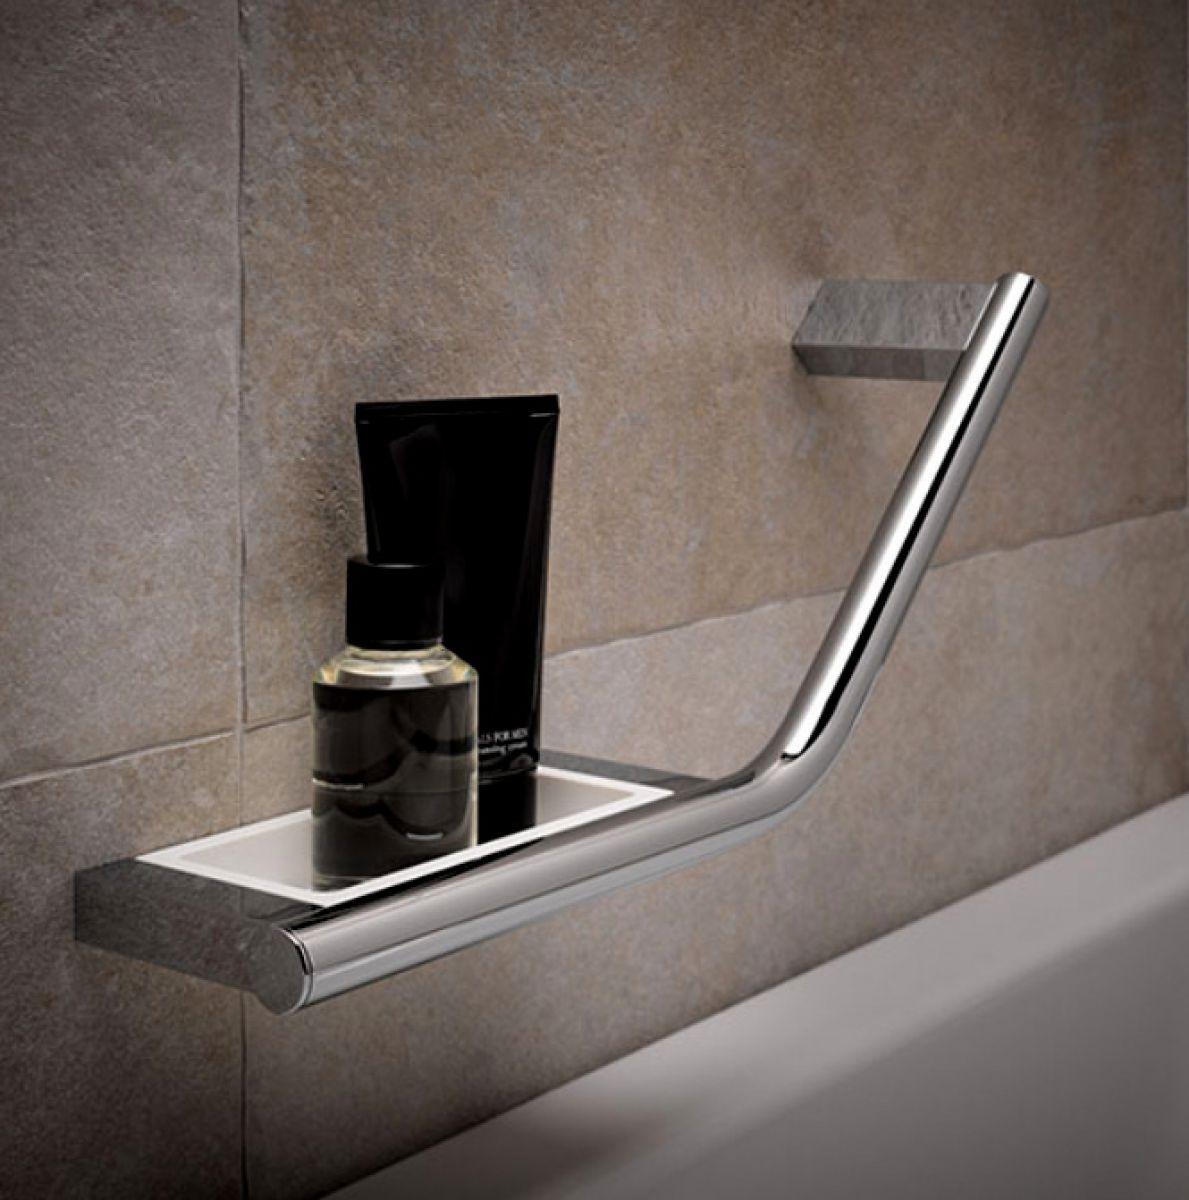 Keuco Moll Lotion Dispenser Bathrooms Direct Yorkshire